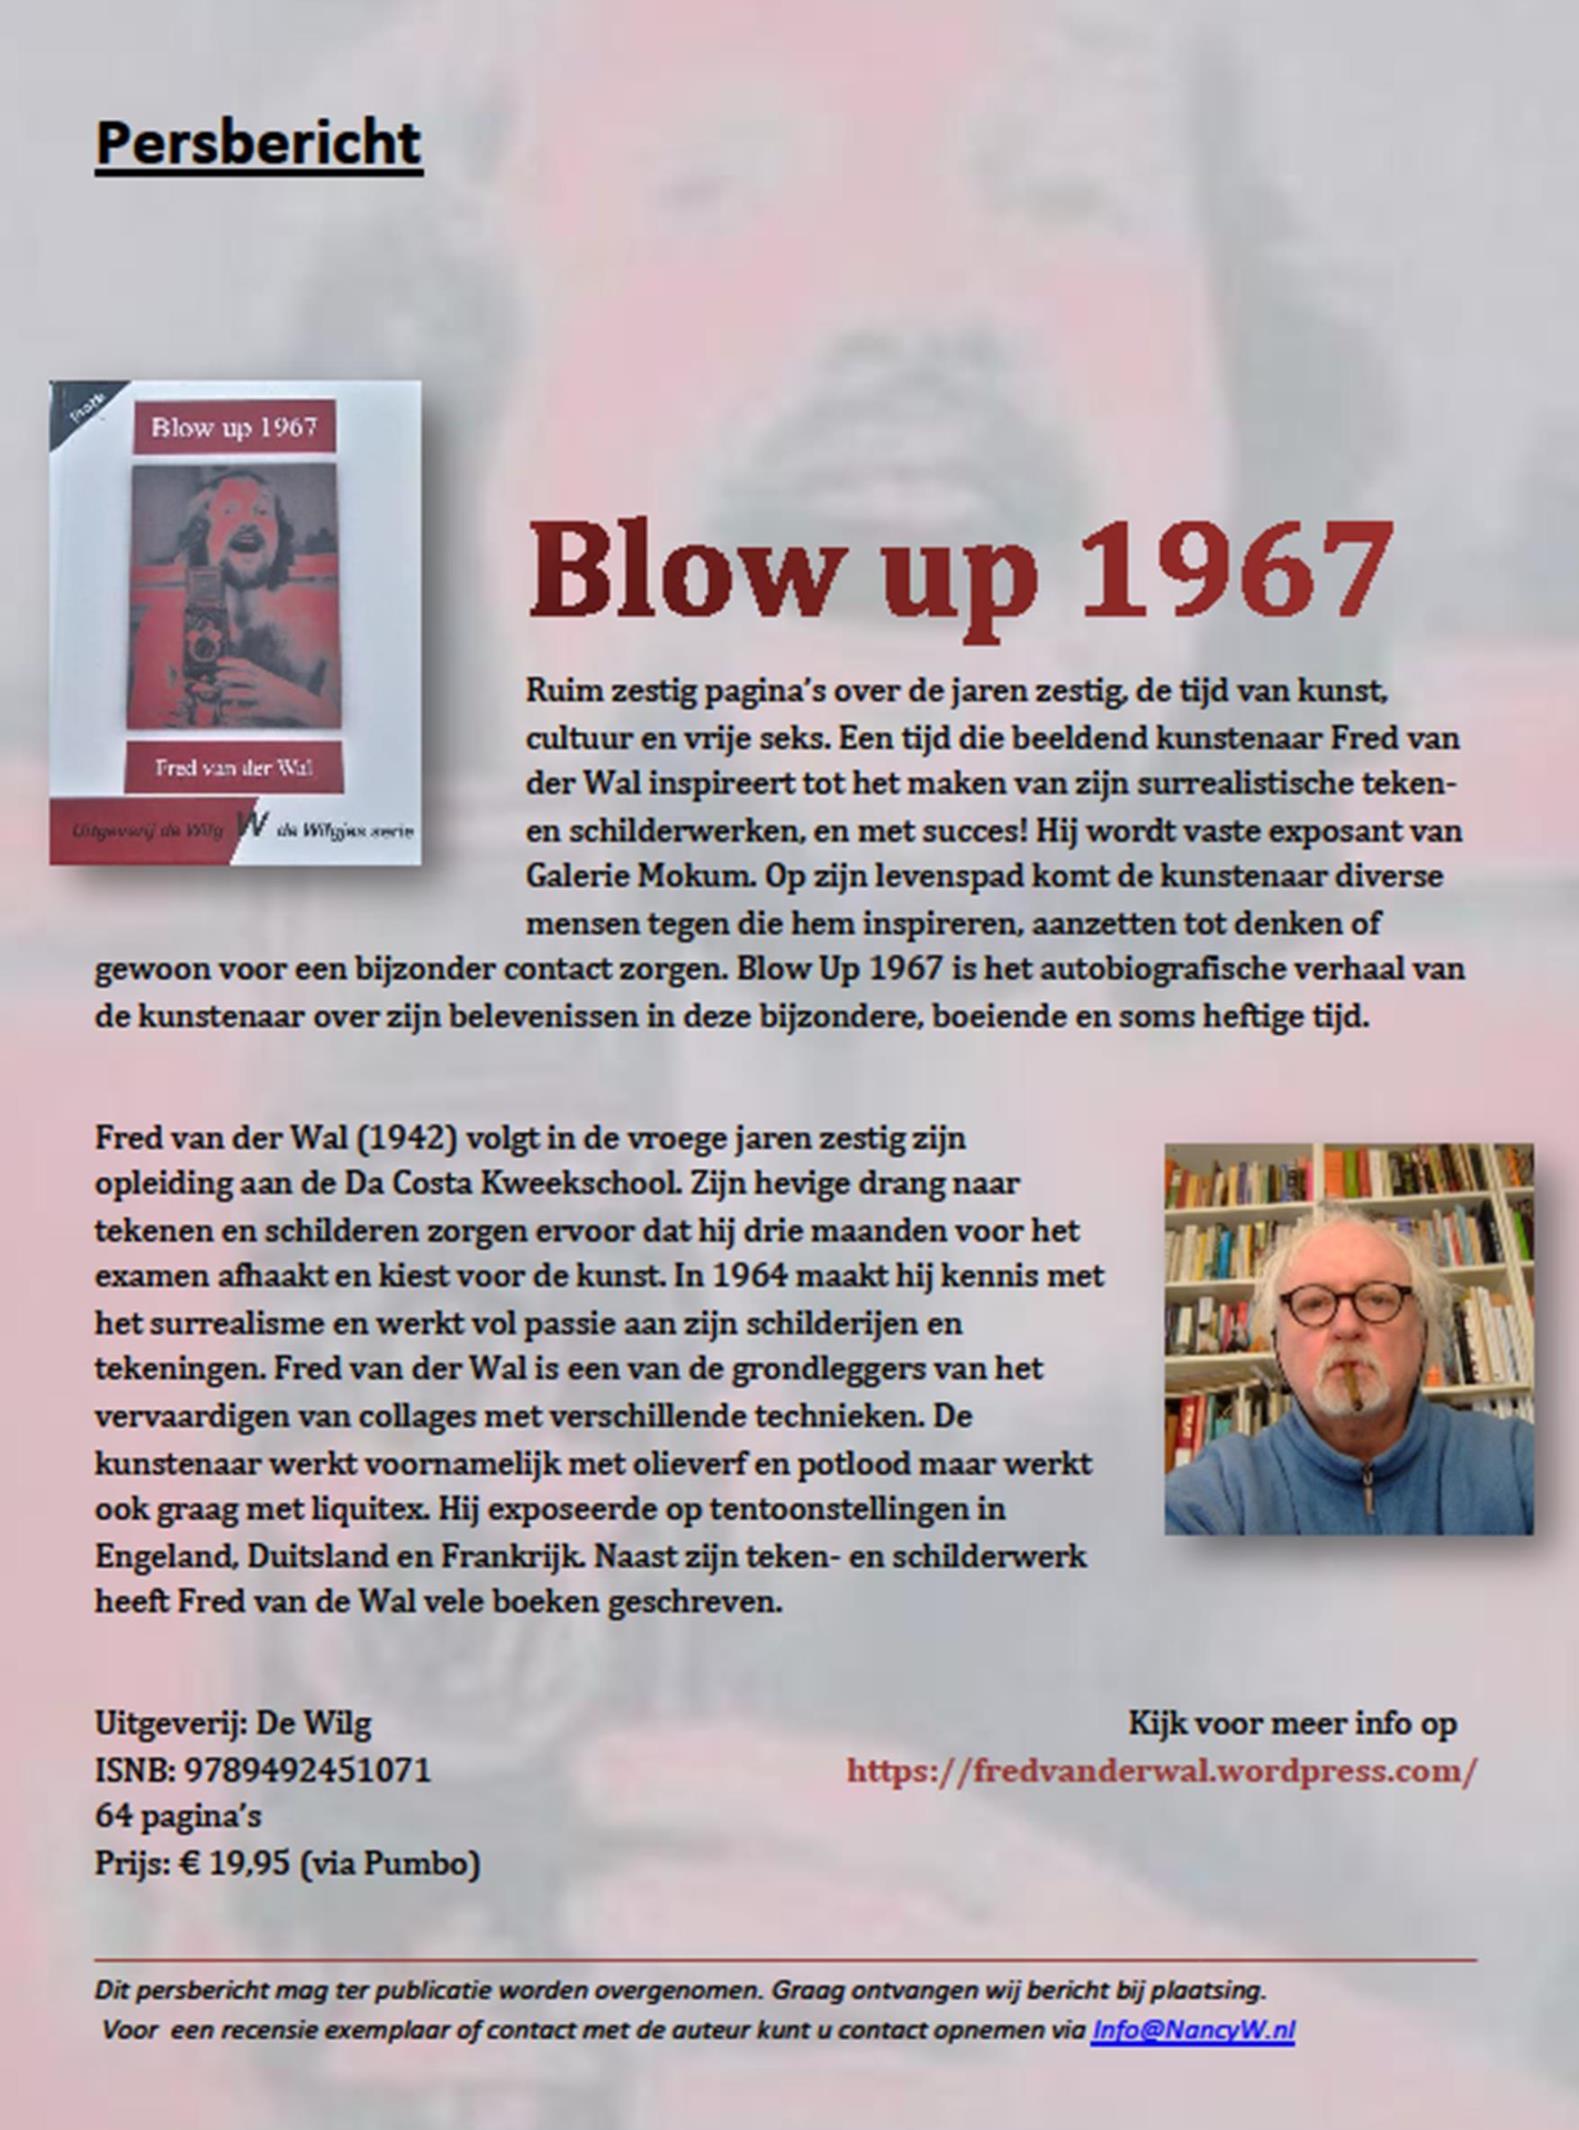 persbericht-blow-up-1967-fred-van-der-wal